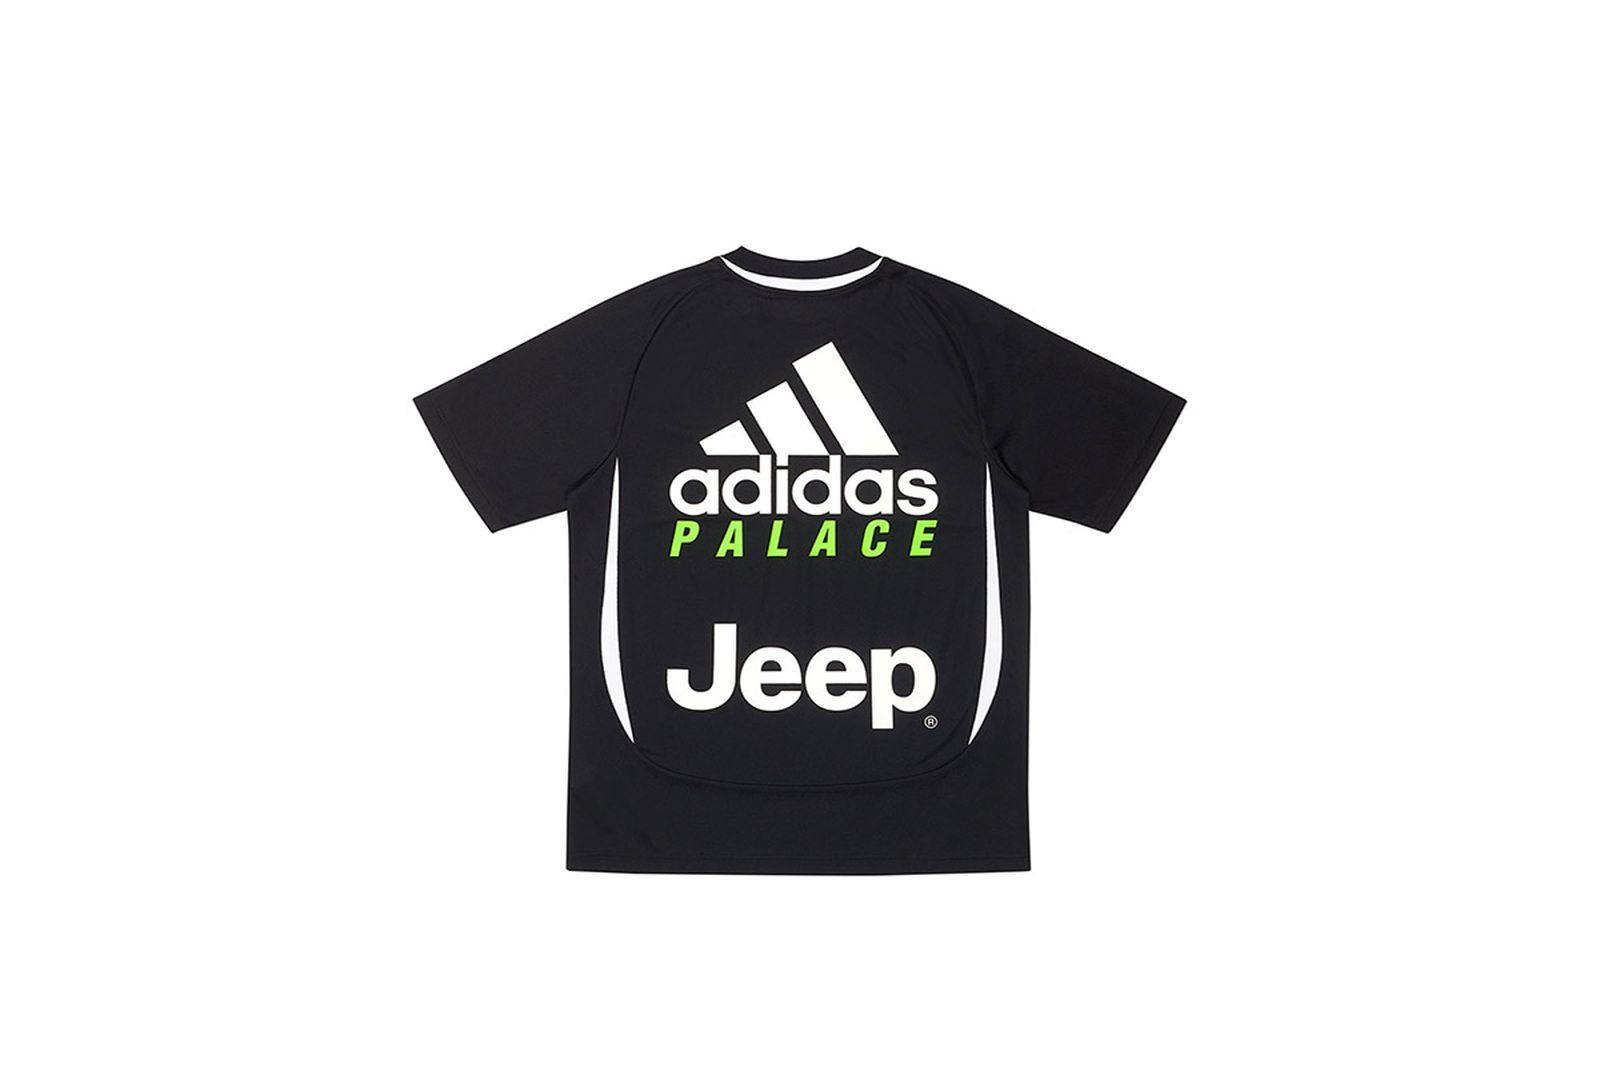 Palace-2019-Adidas-Juventus-Shirt-Training-black--19604